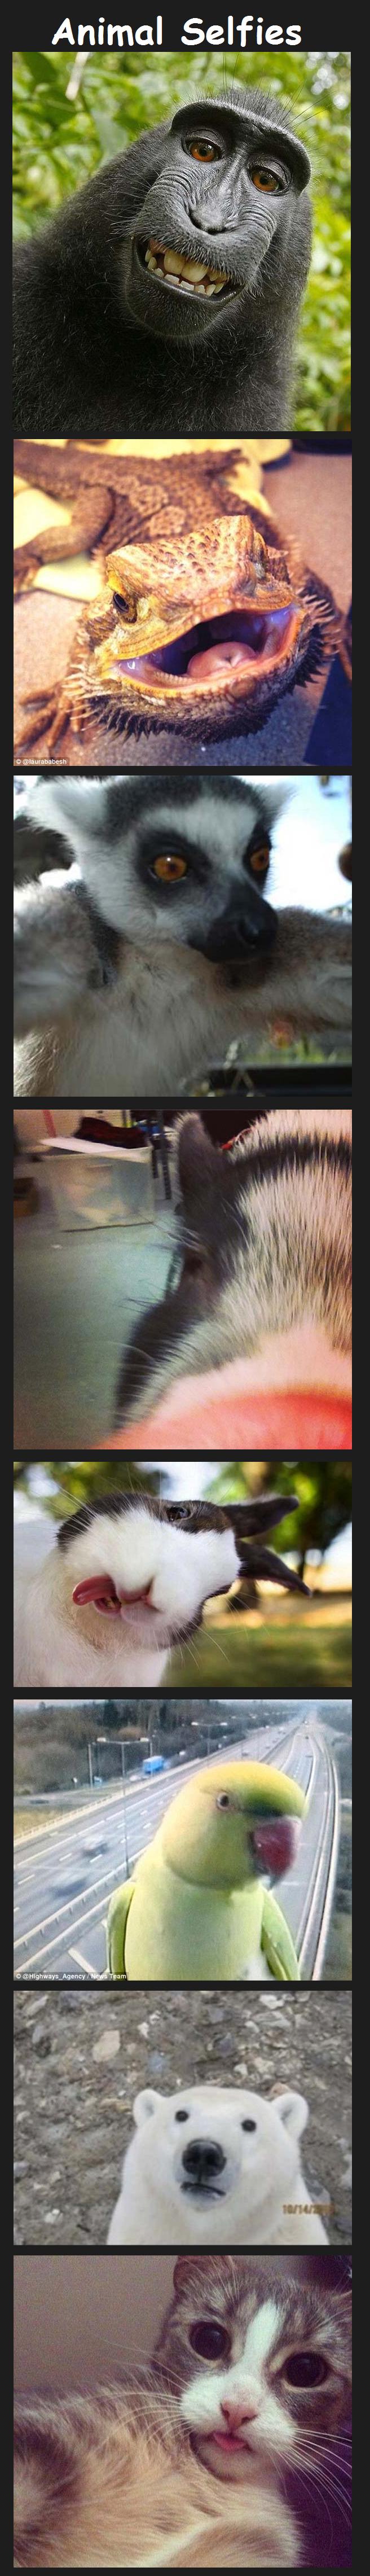 Animal Selfies Part 2. .. Part 1: